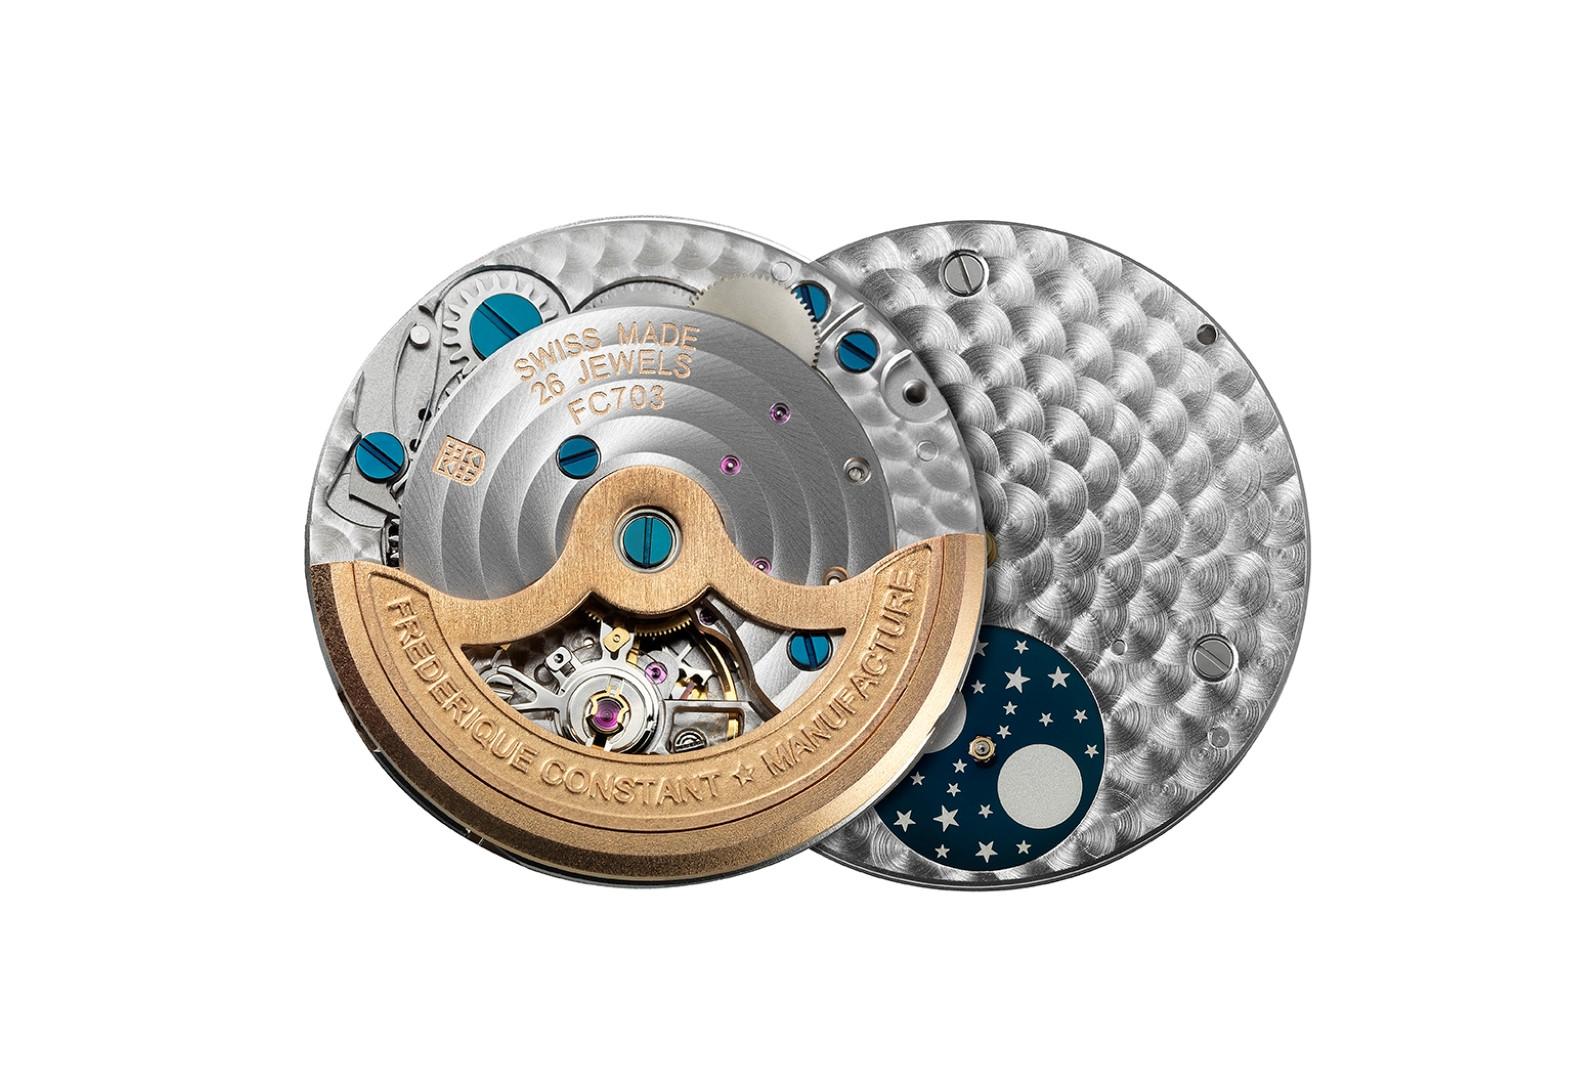 Slimline Moonphase Manufacture For Women - Calibre